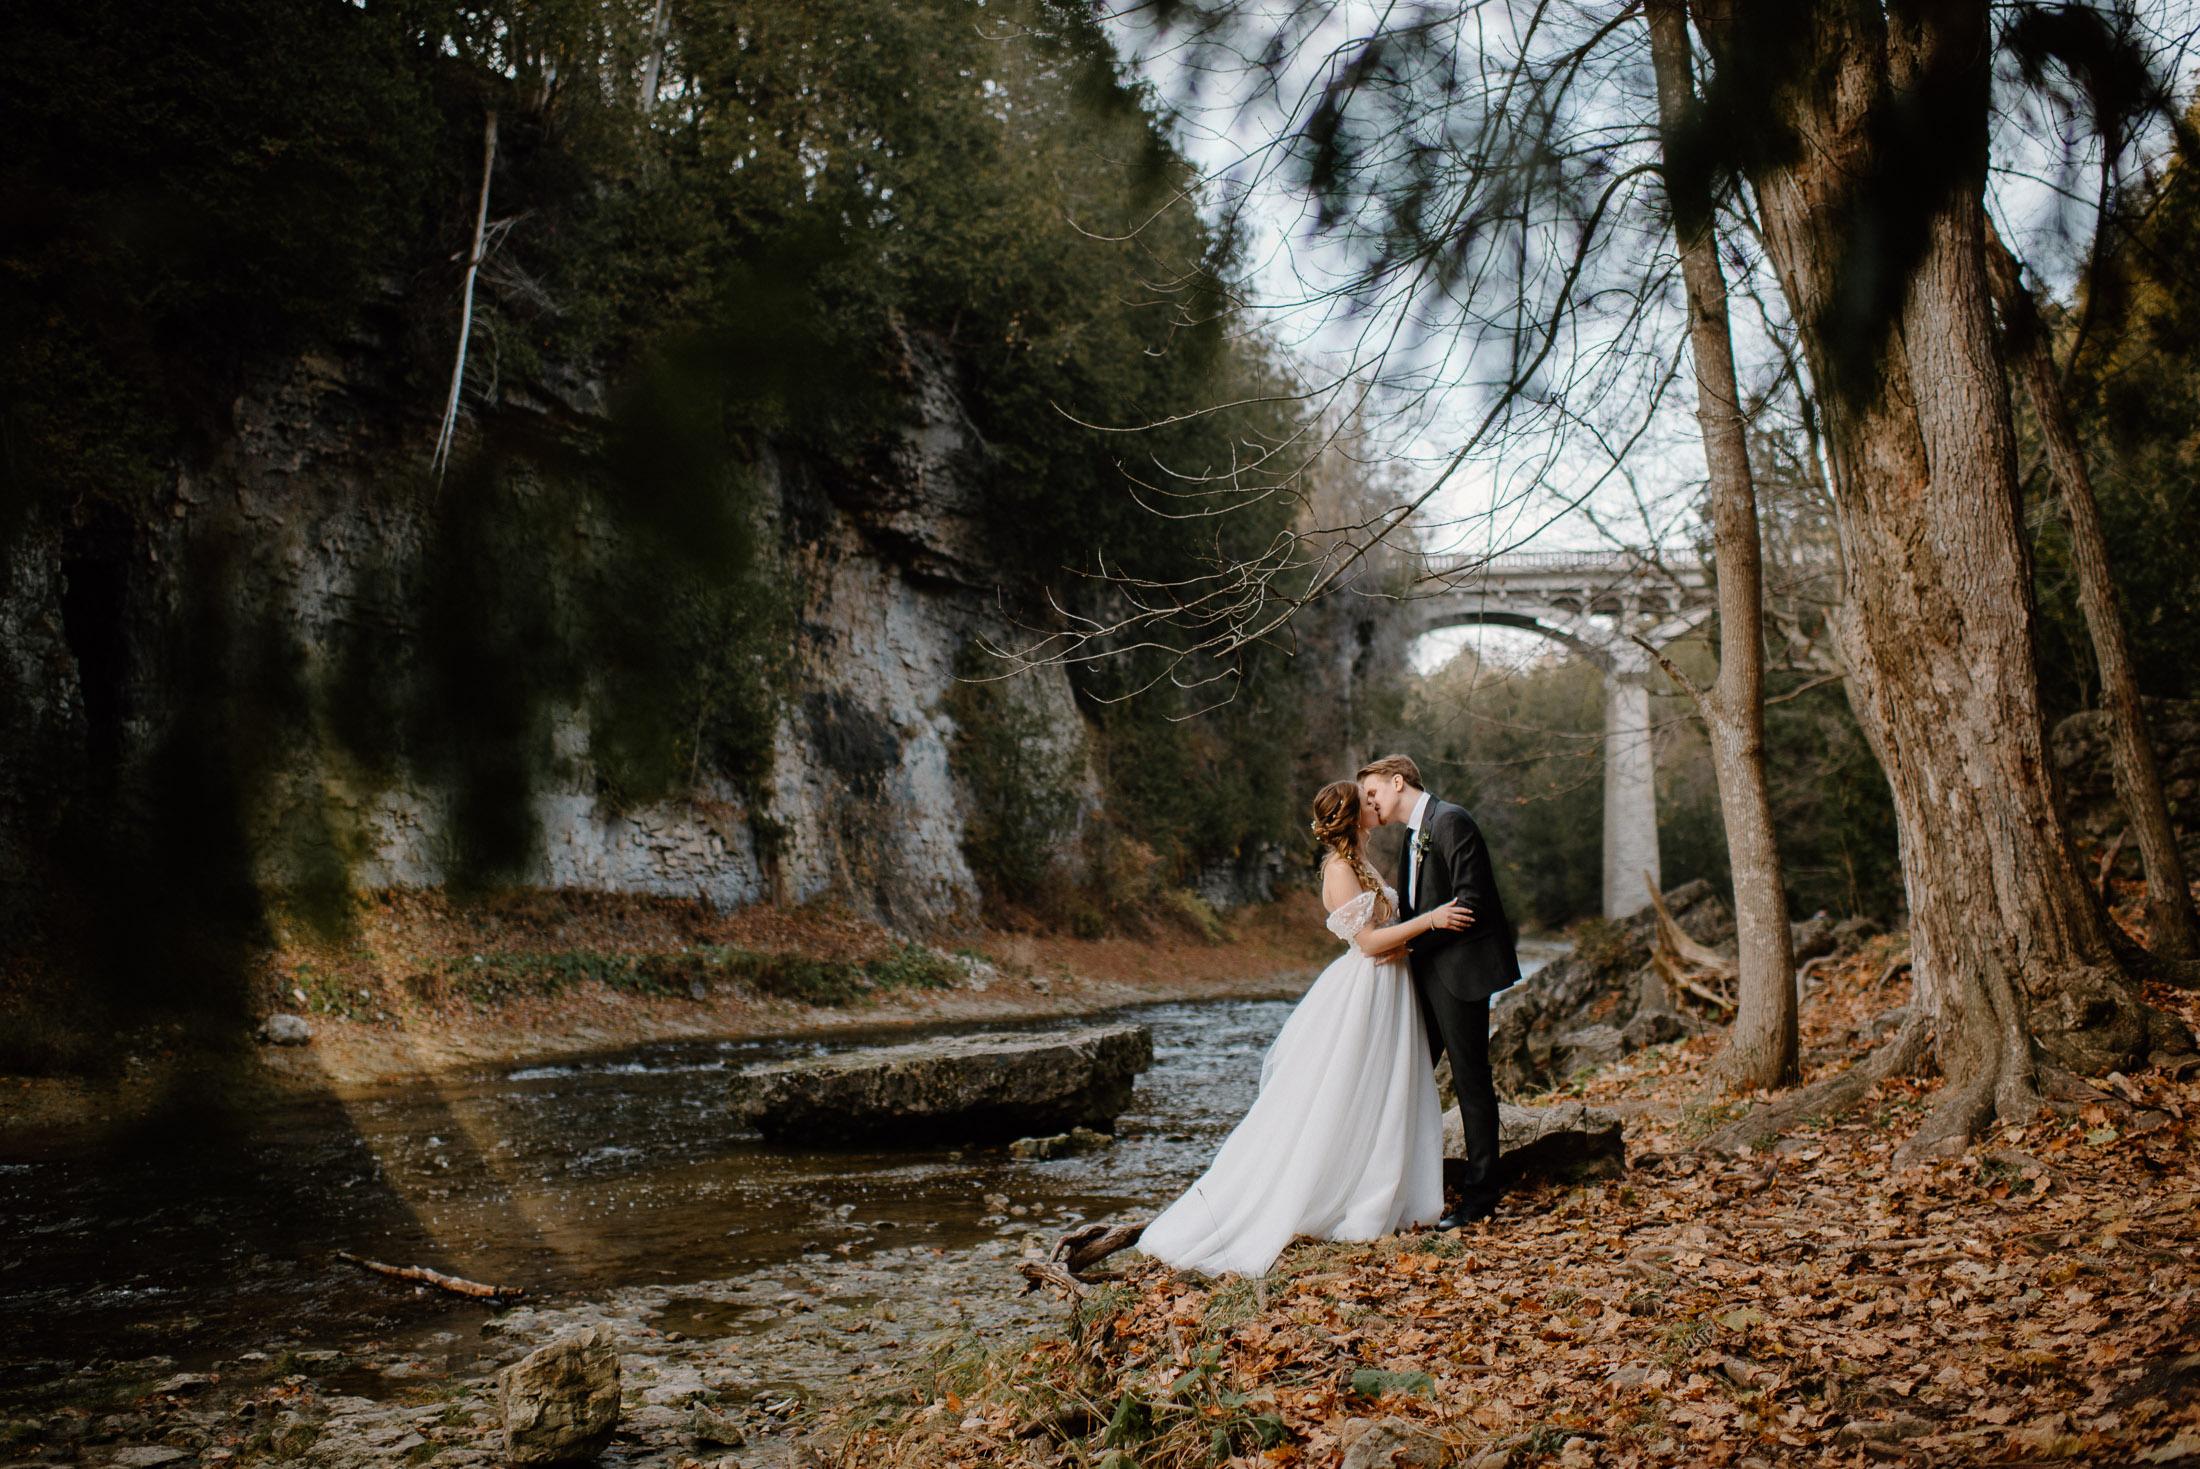 Haley and Aidan Wedding Photo in Elora Gorge in Ontario Canada